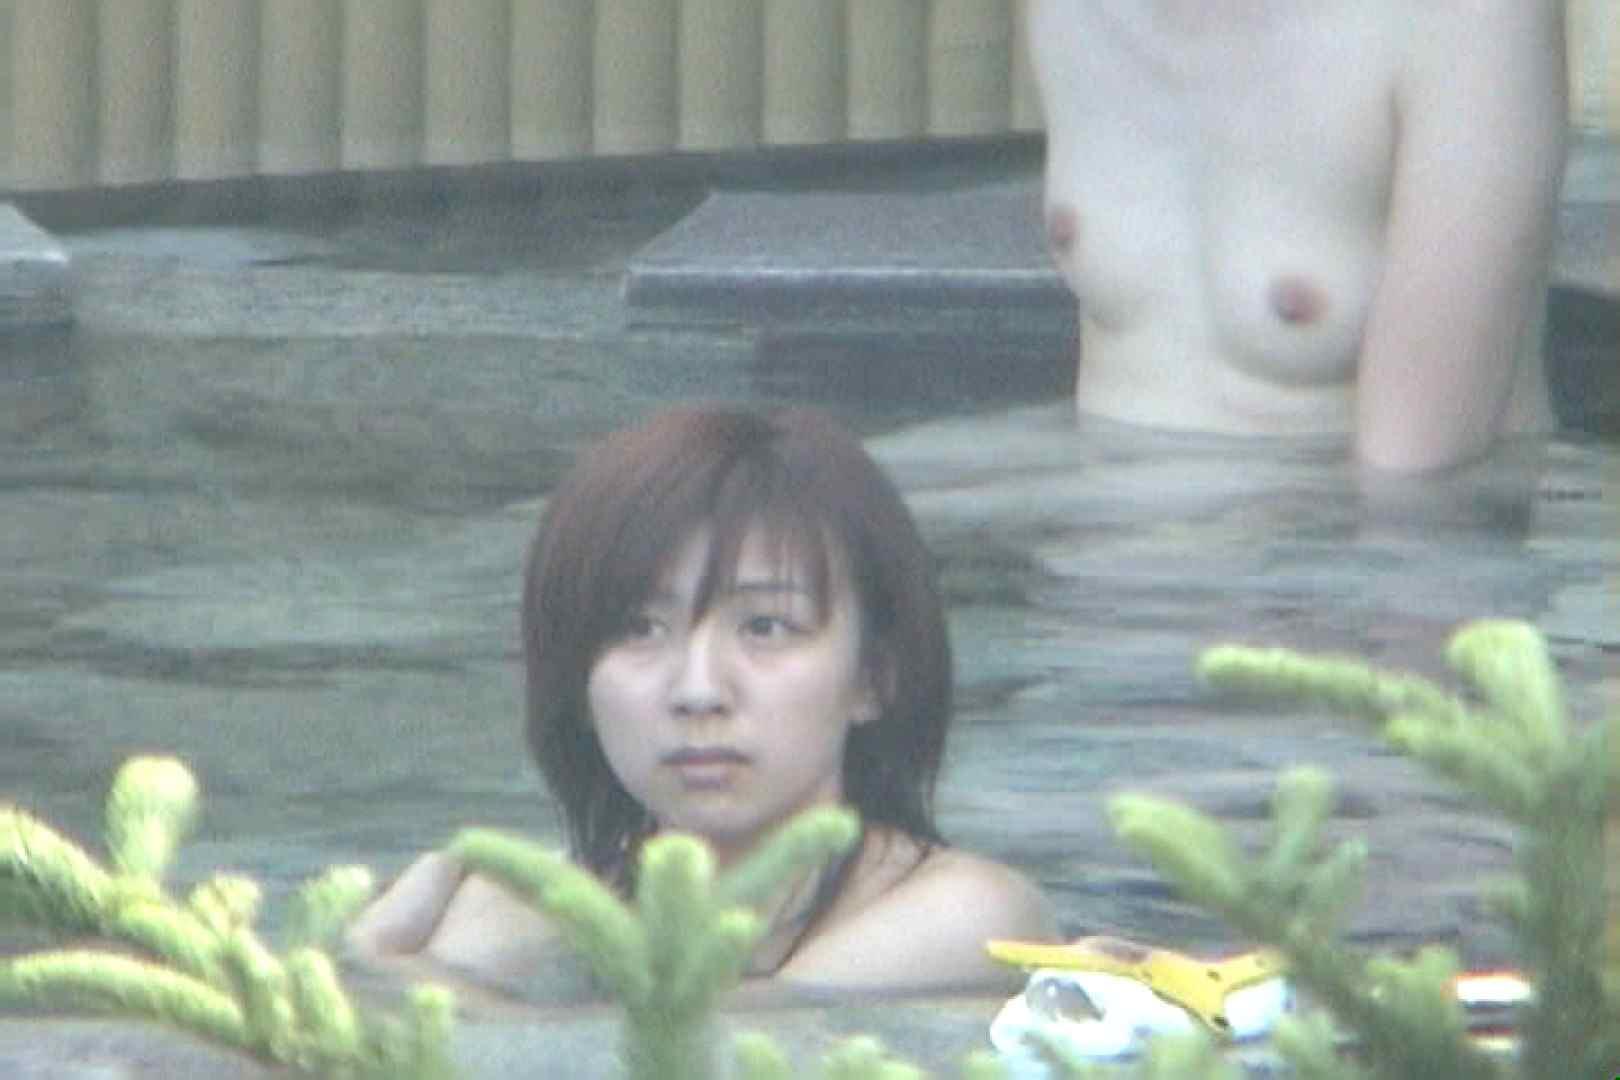 Aquaな露天風呂Vol.77【VIP限定】 露天   盗撮特集  98画像 63